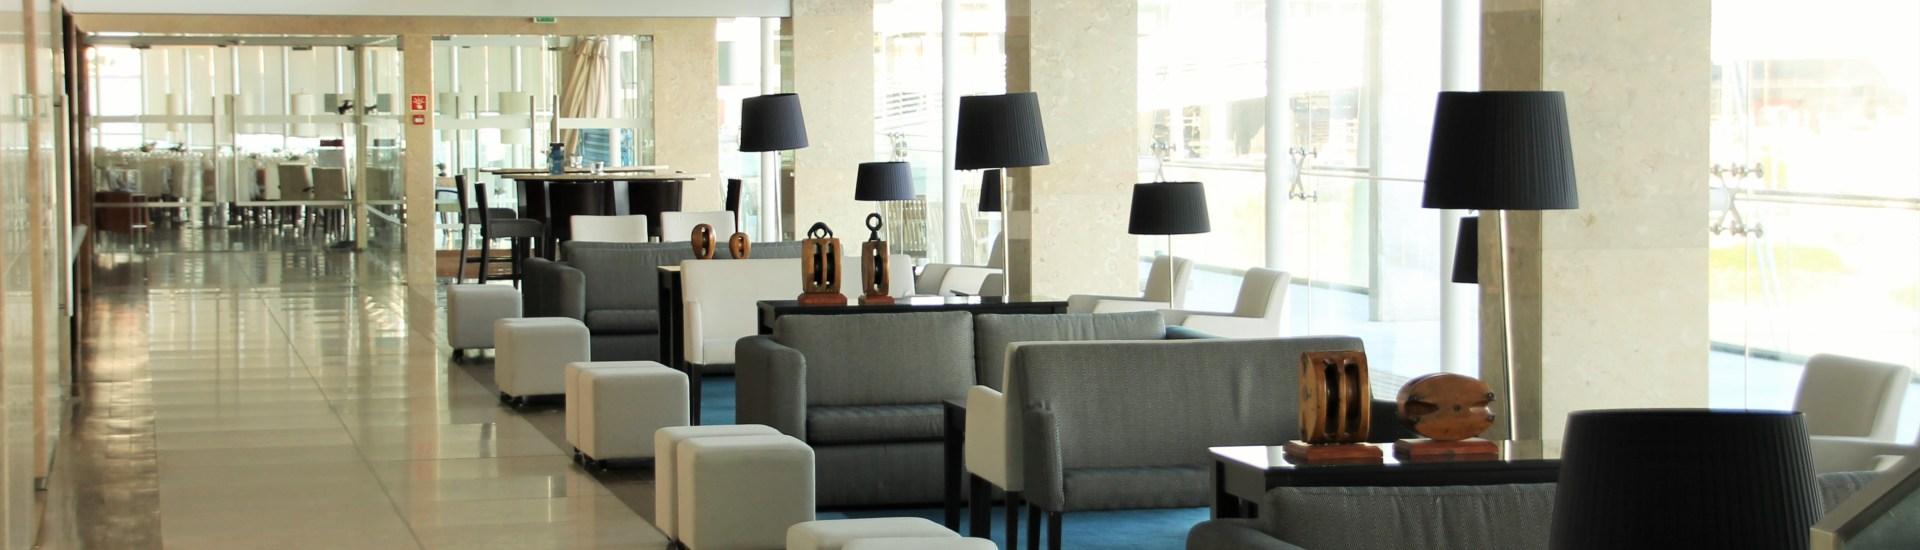 Hotel Marina Atlântico - In the Center of it All